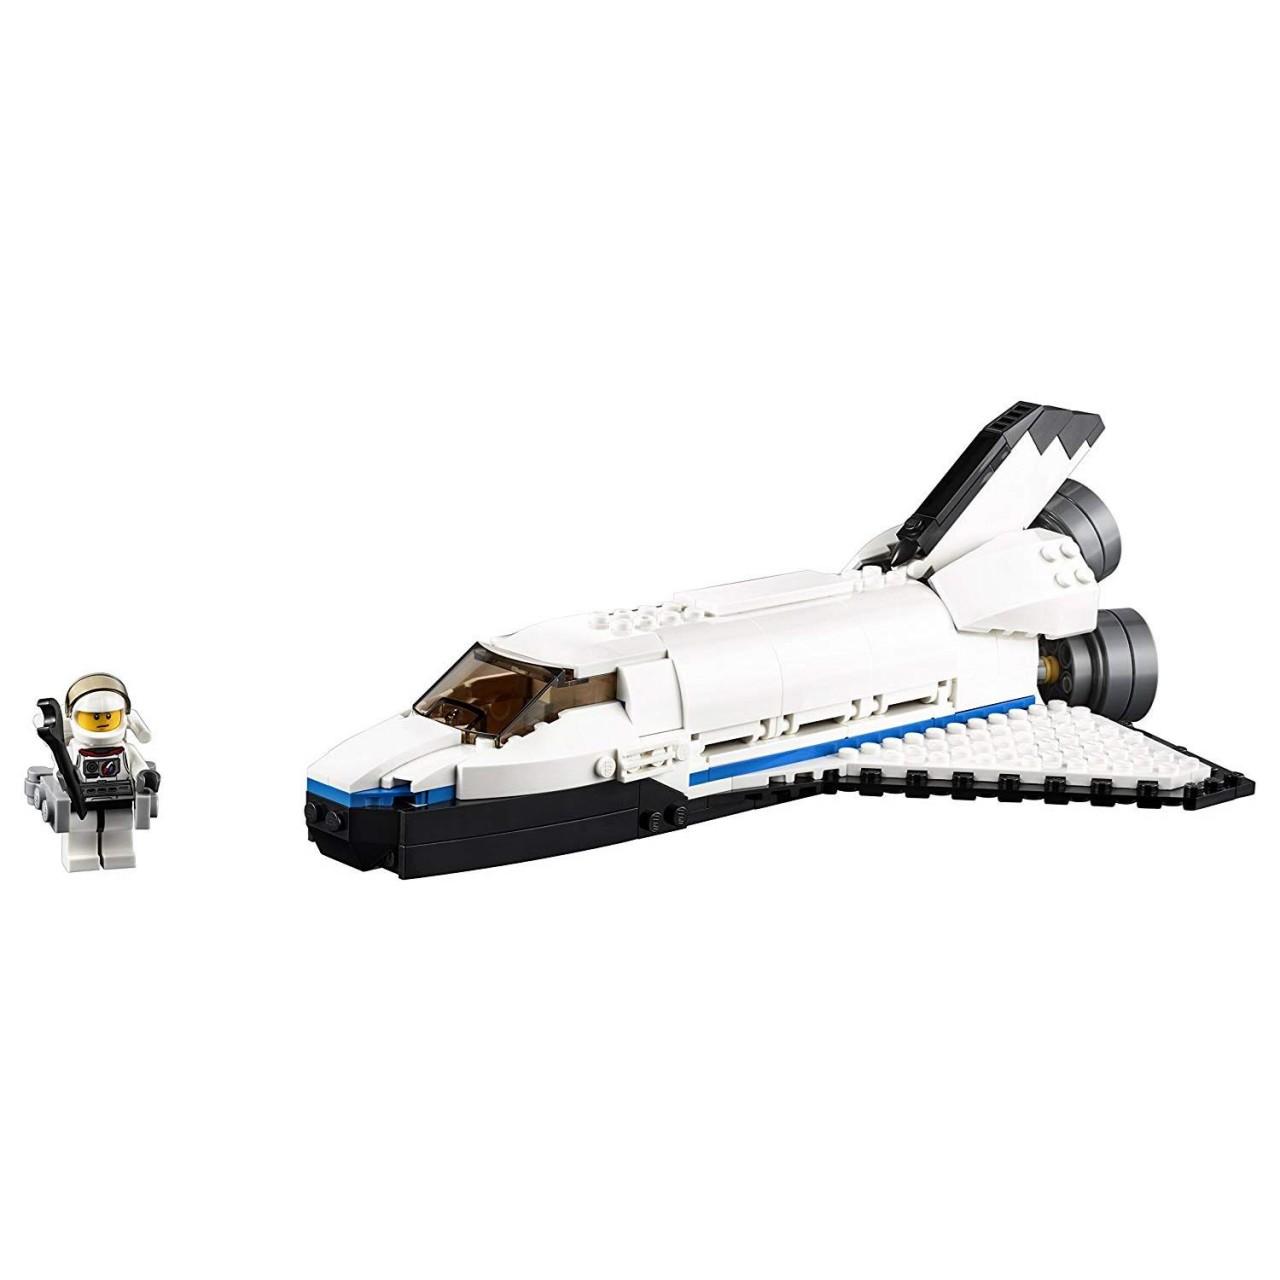 LEGO CREATOR 31066 Forschungs-Spaceshuttle